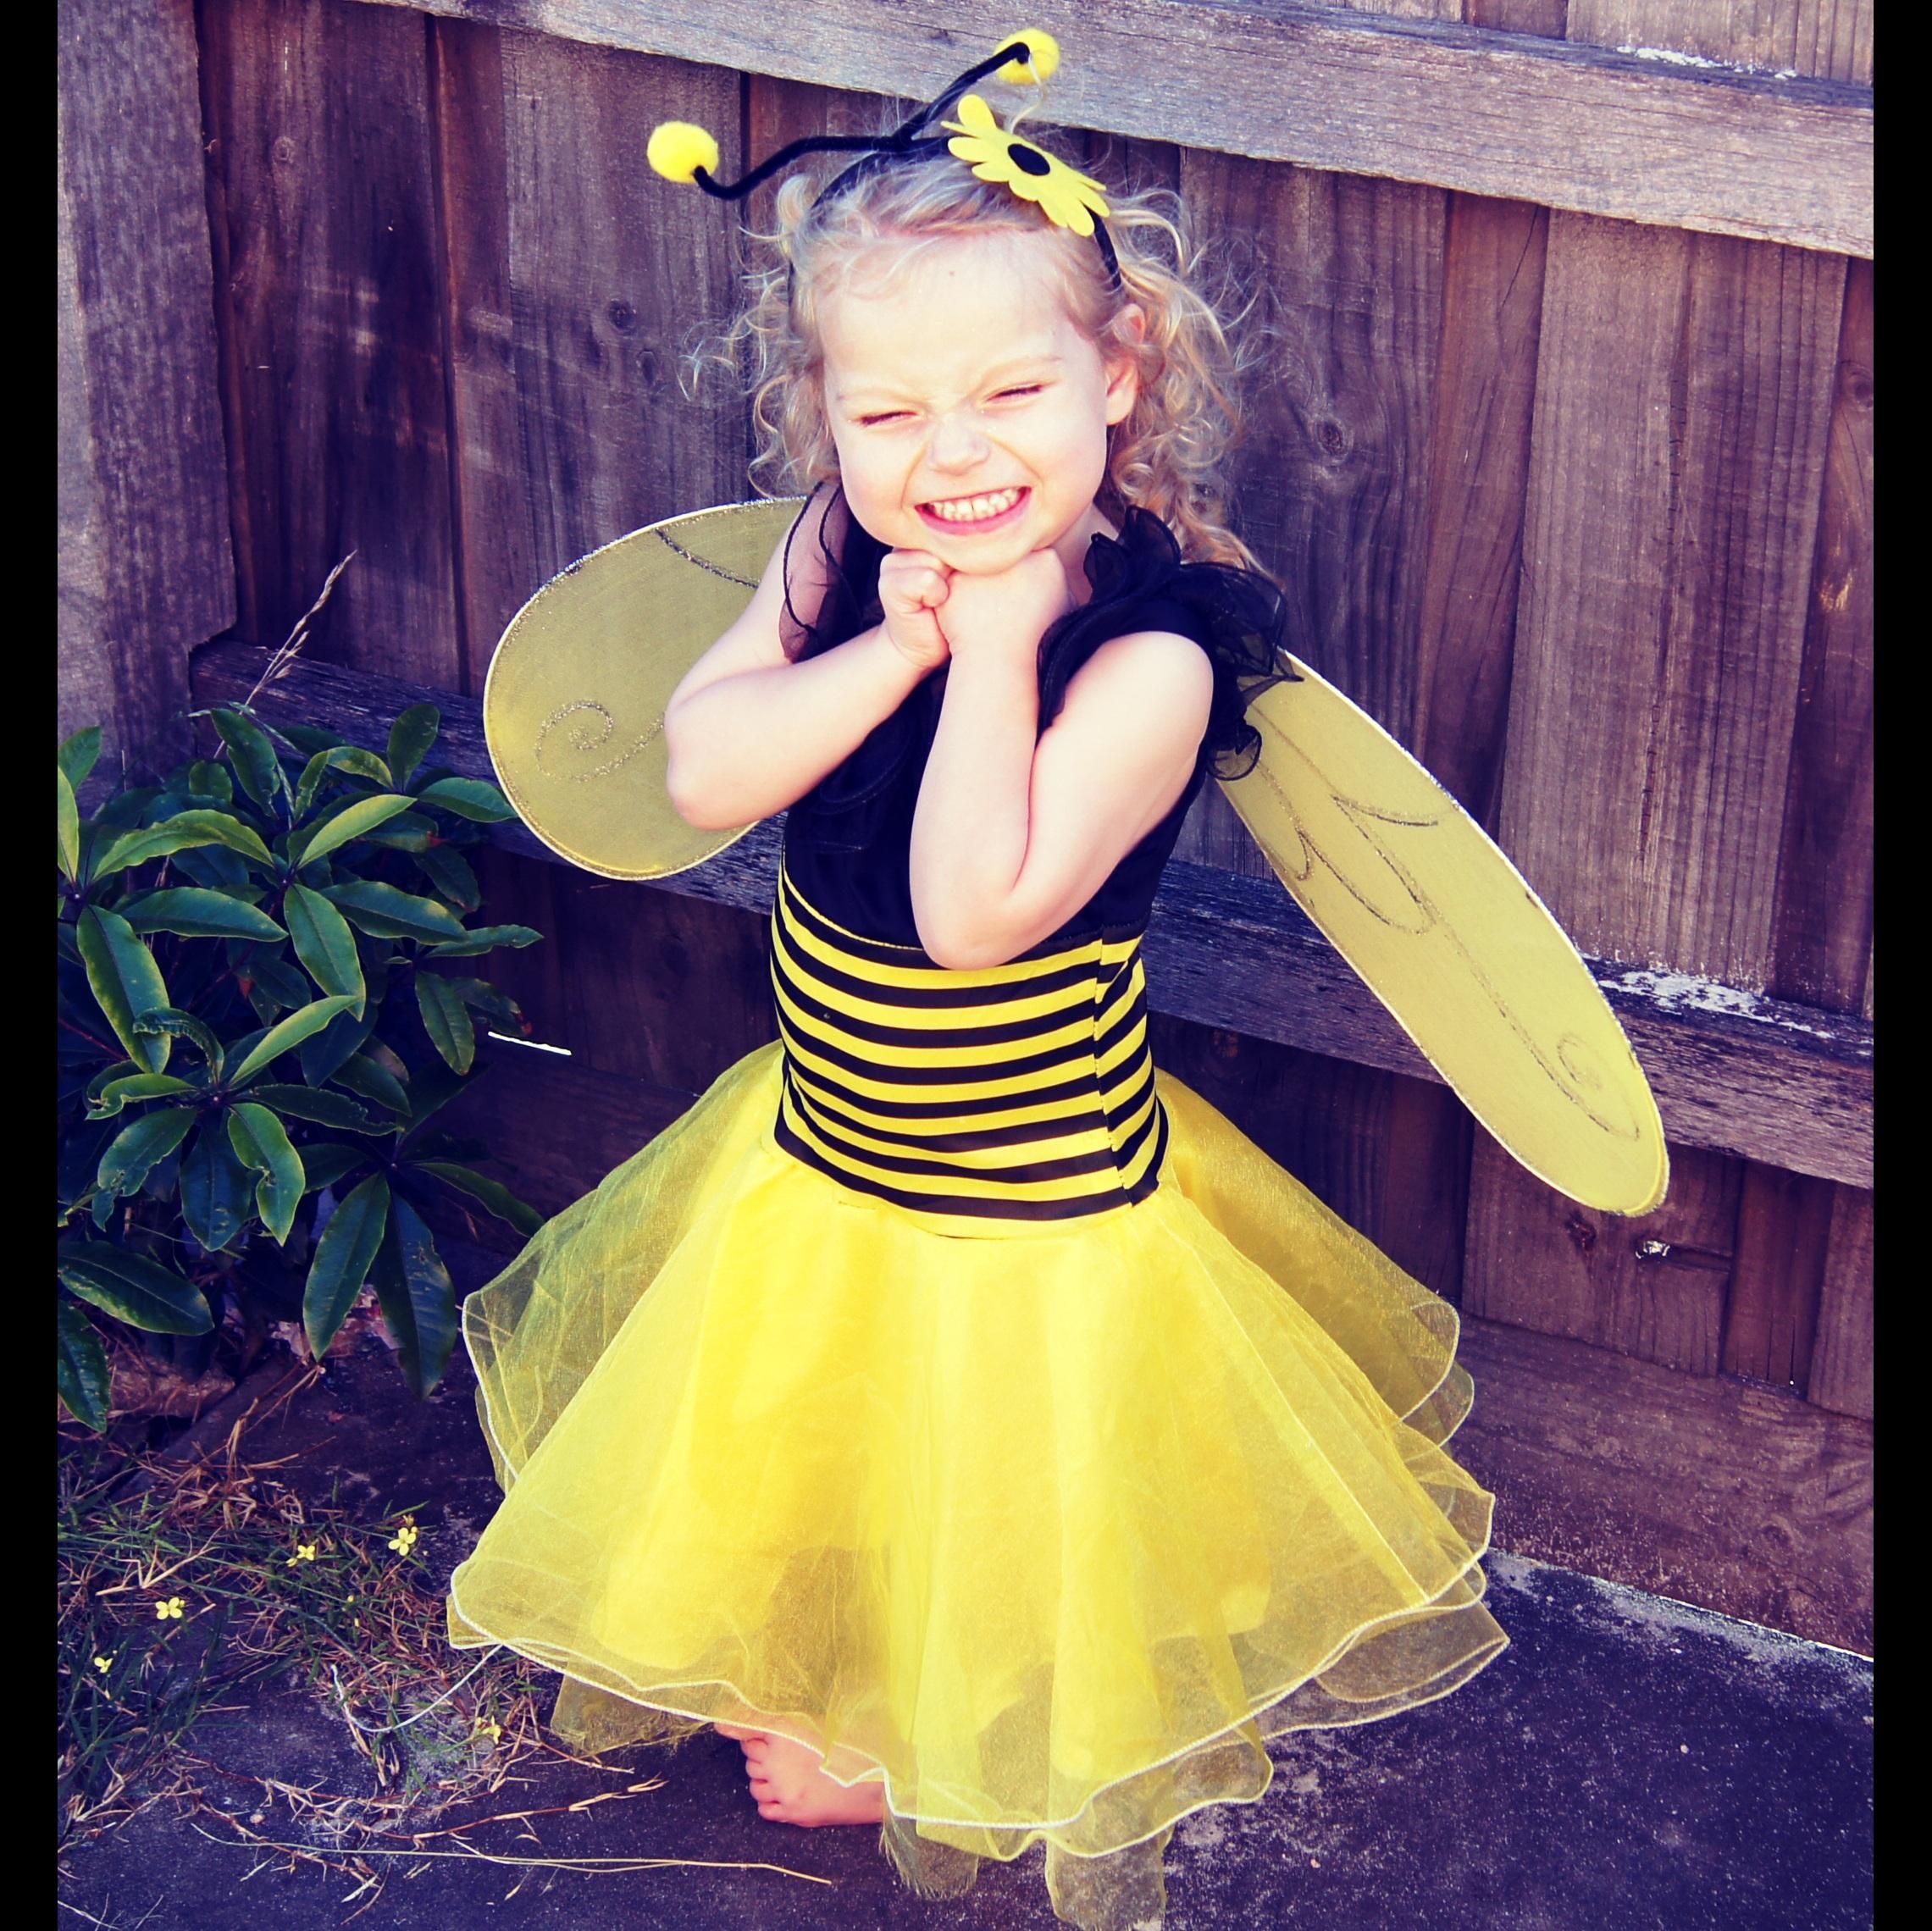 e821fe0d144b person pige Spille nuttet barn tøj gul baby barndom smil glad børn kjole  lille barn bi